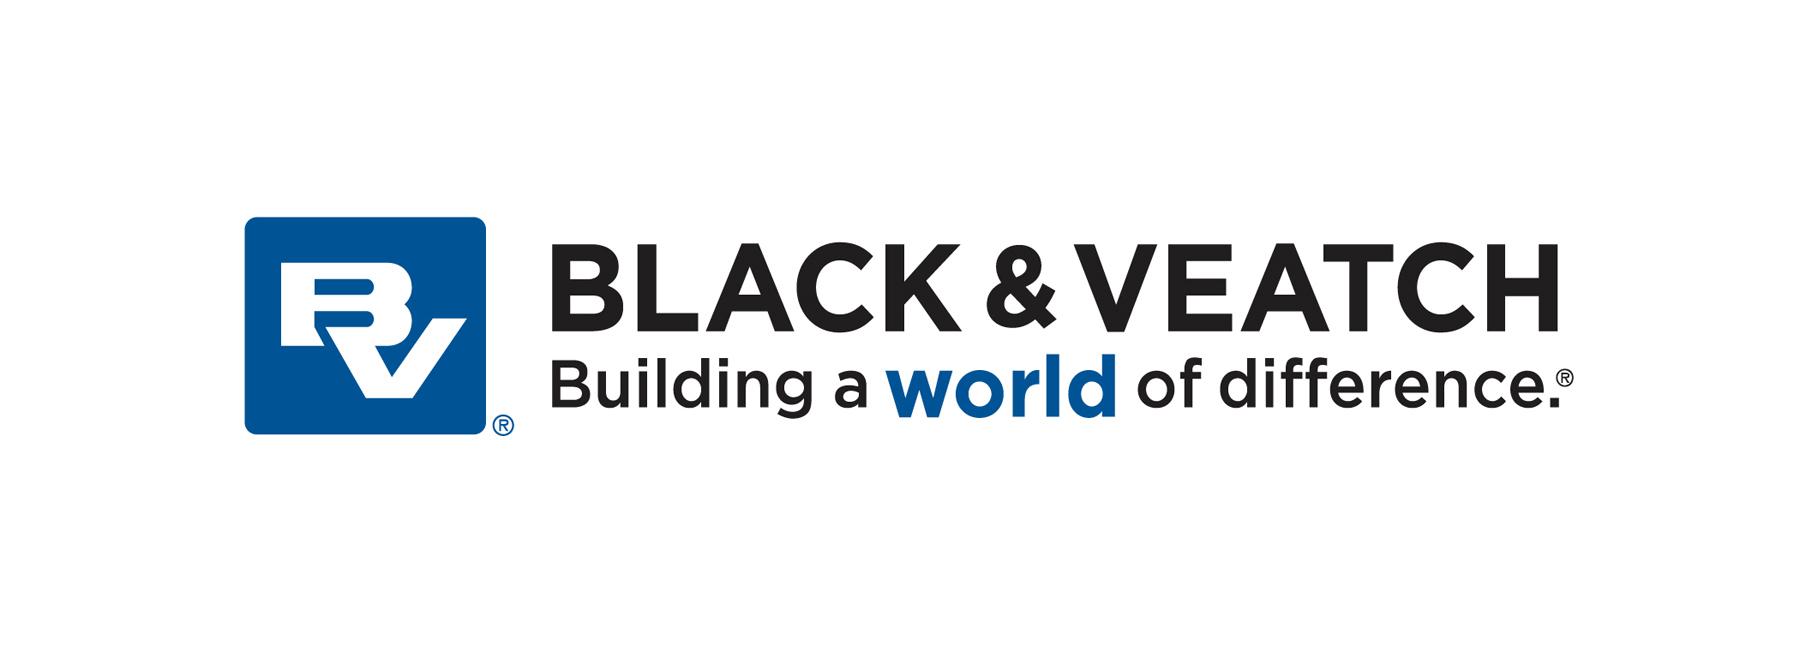 Black & Veatch.jpg